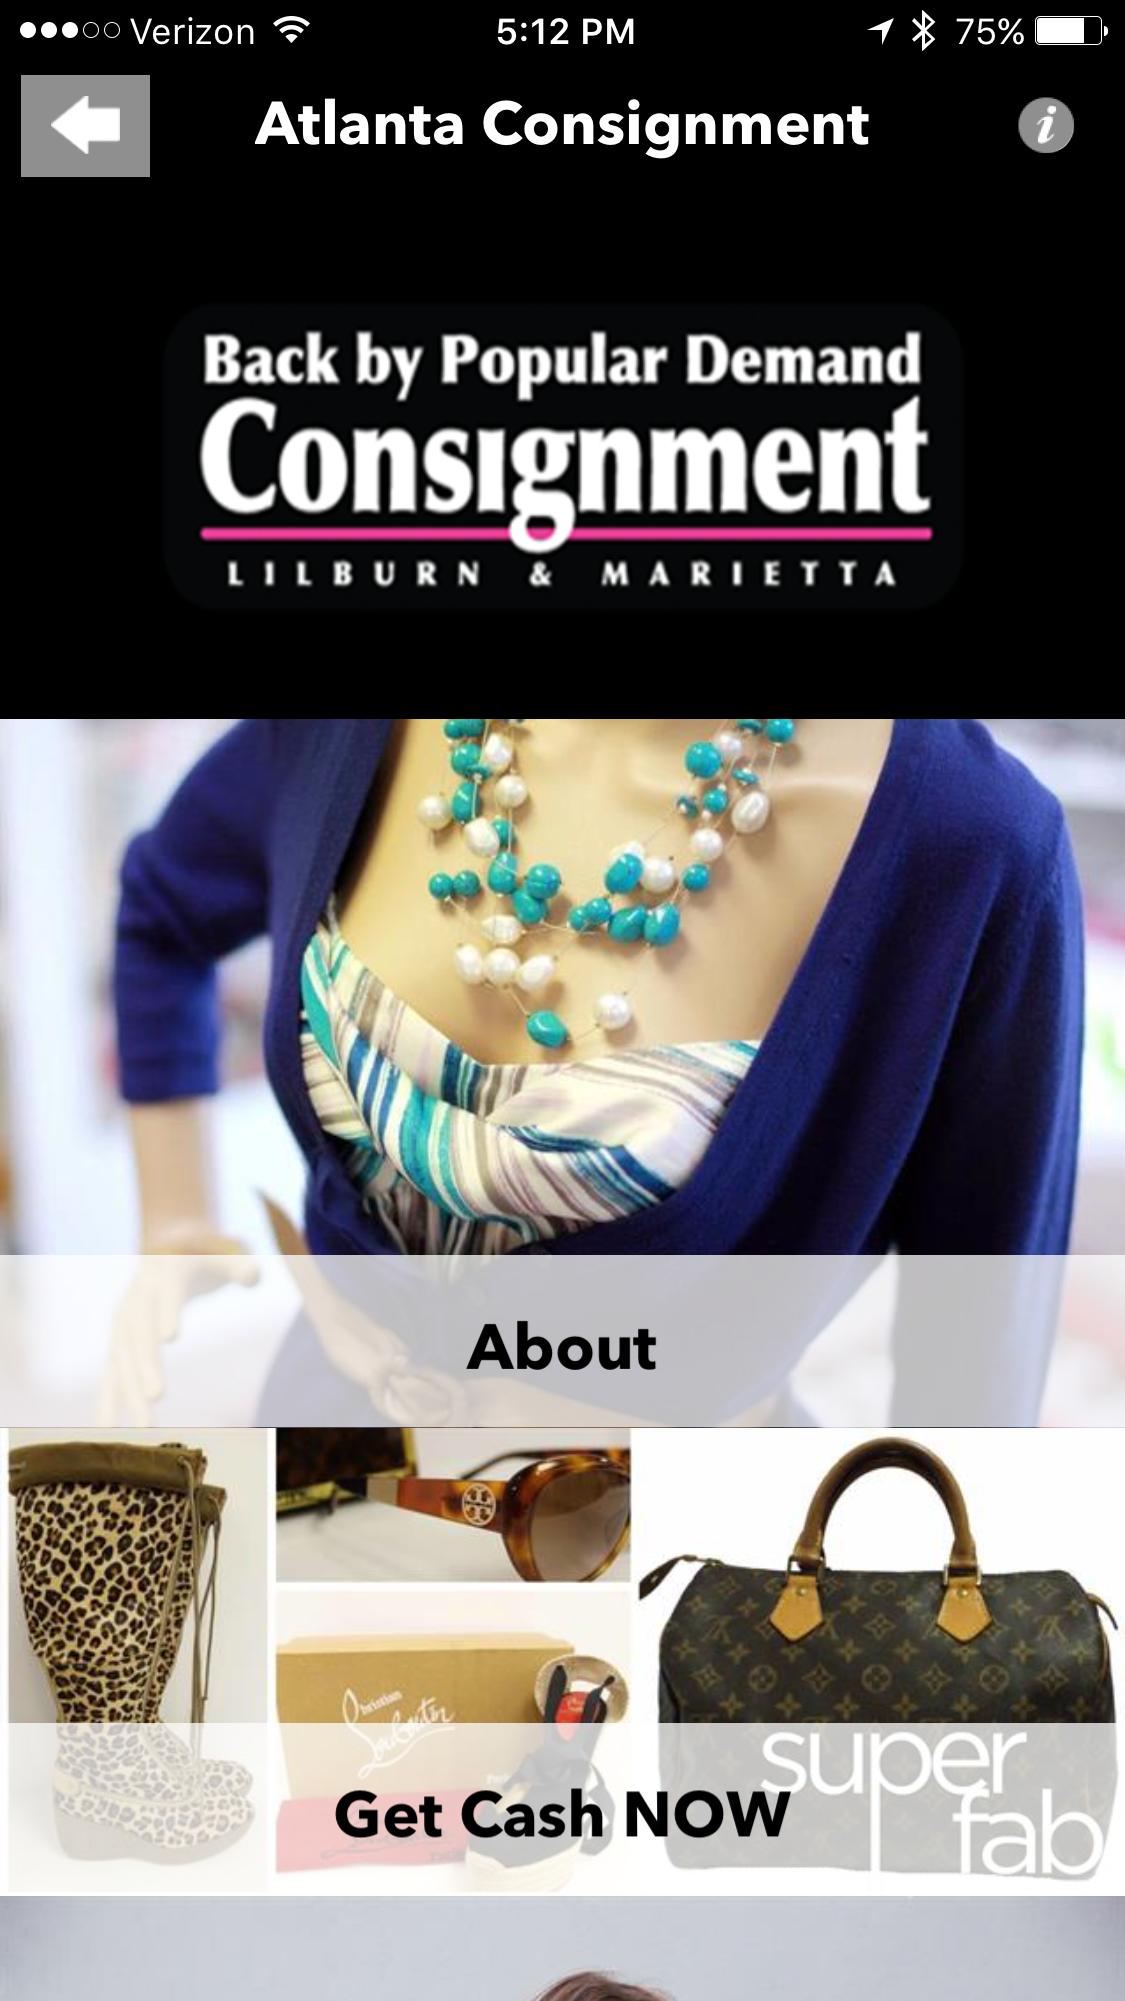 Back By Popular Demand Consignment Store - Mobile App  Brandgarden.biz